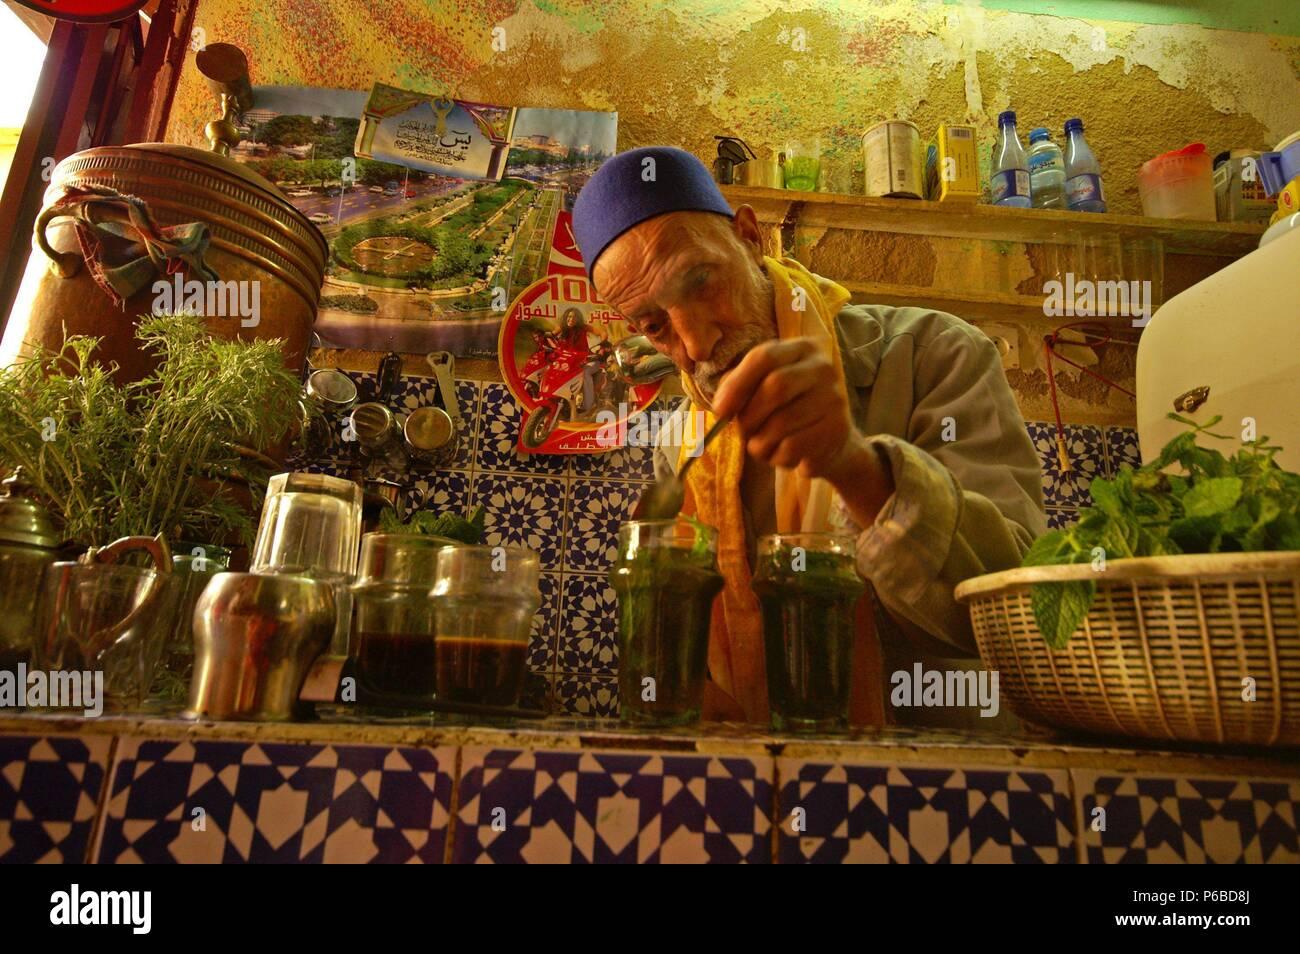 Teteria tradicional. Fez. Marruecos. Magreb. Africa. Stock Photo